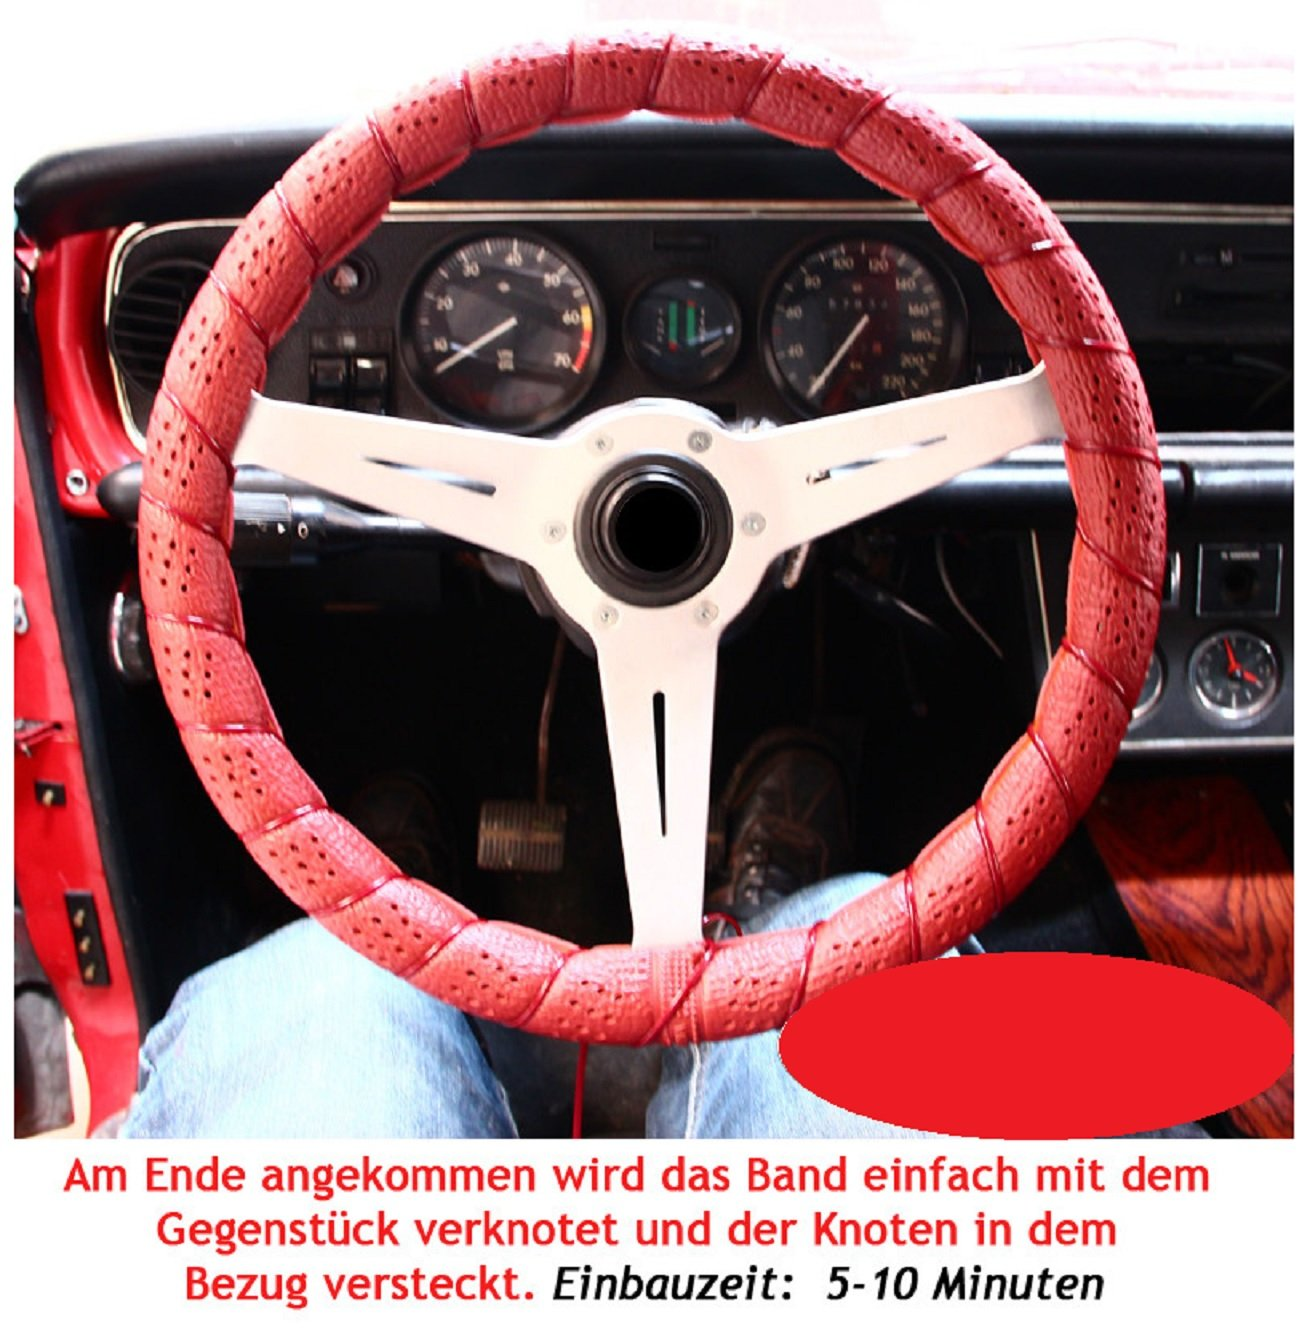 2 x  Lenkradbezug-Lenkradschoner zum selber Schn/üren SCHWARZ